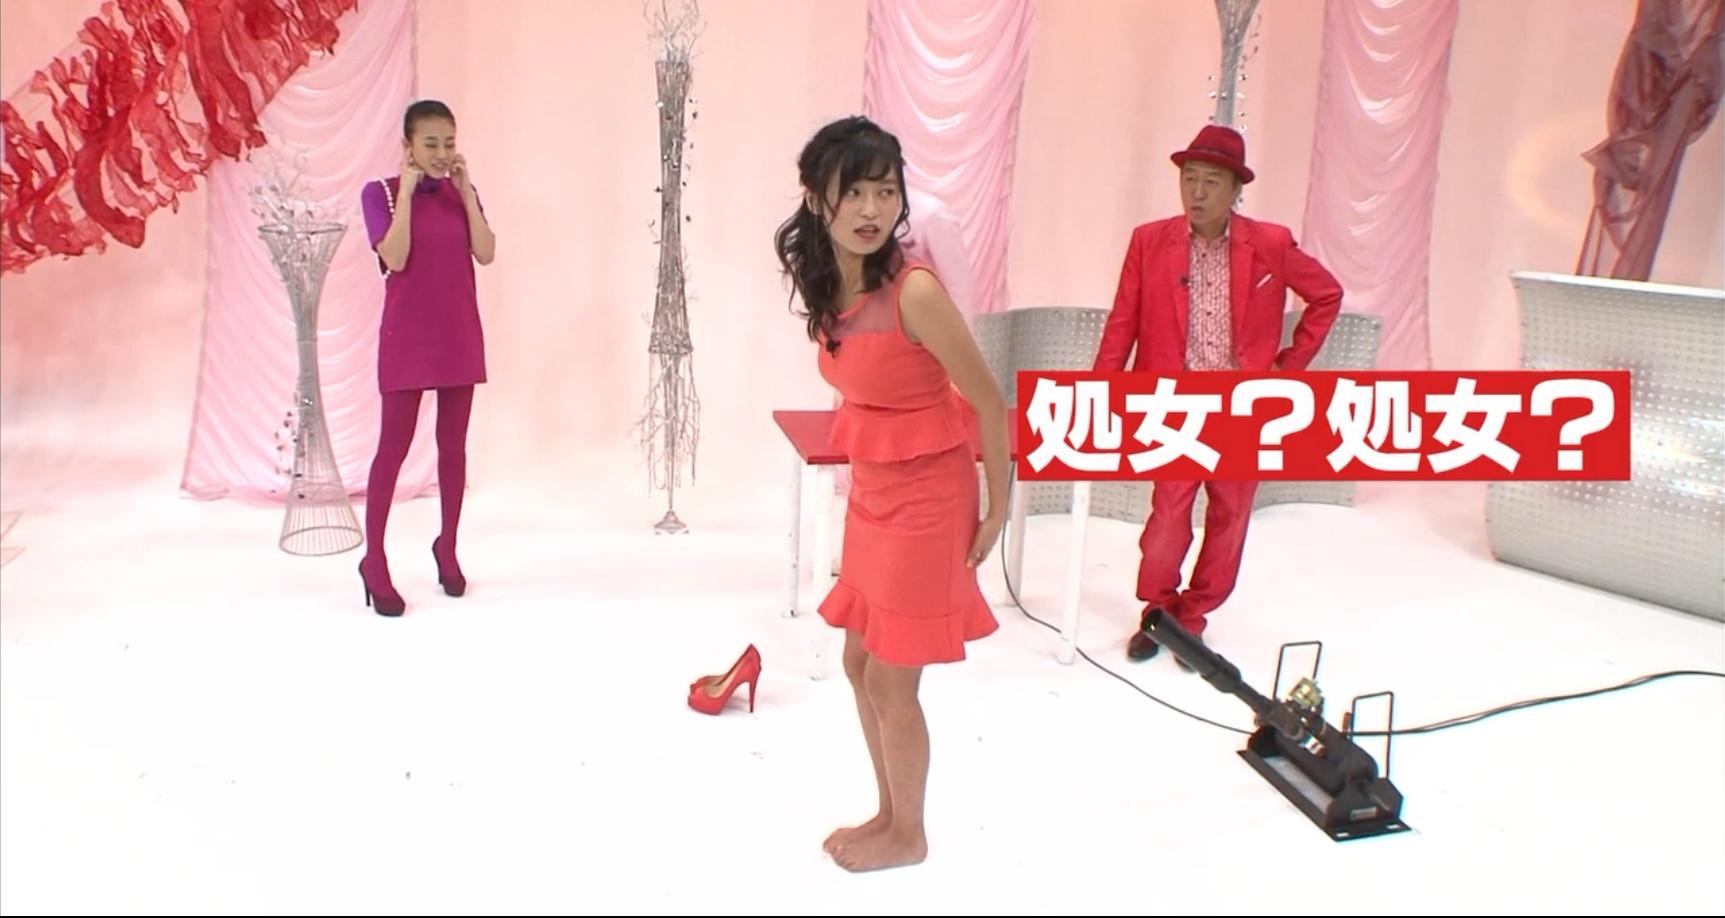 小島瑠璃子がネット番組で尻を撮られまくってる件☆☆☆wwwwwwwwwwwwww